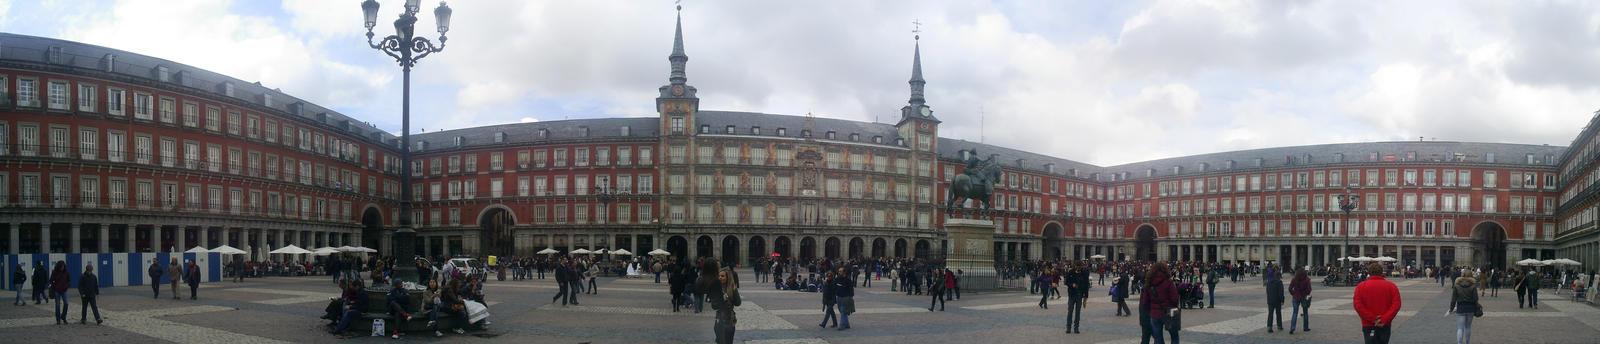 Plaza Mayor de Madrid by Cannabeanoide